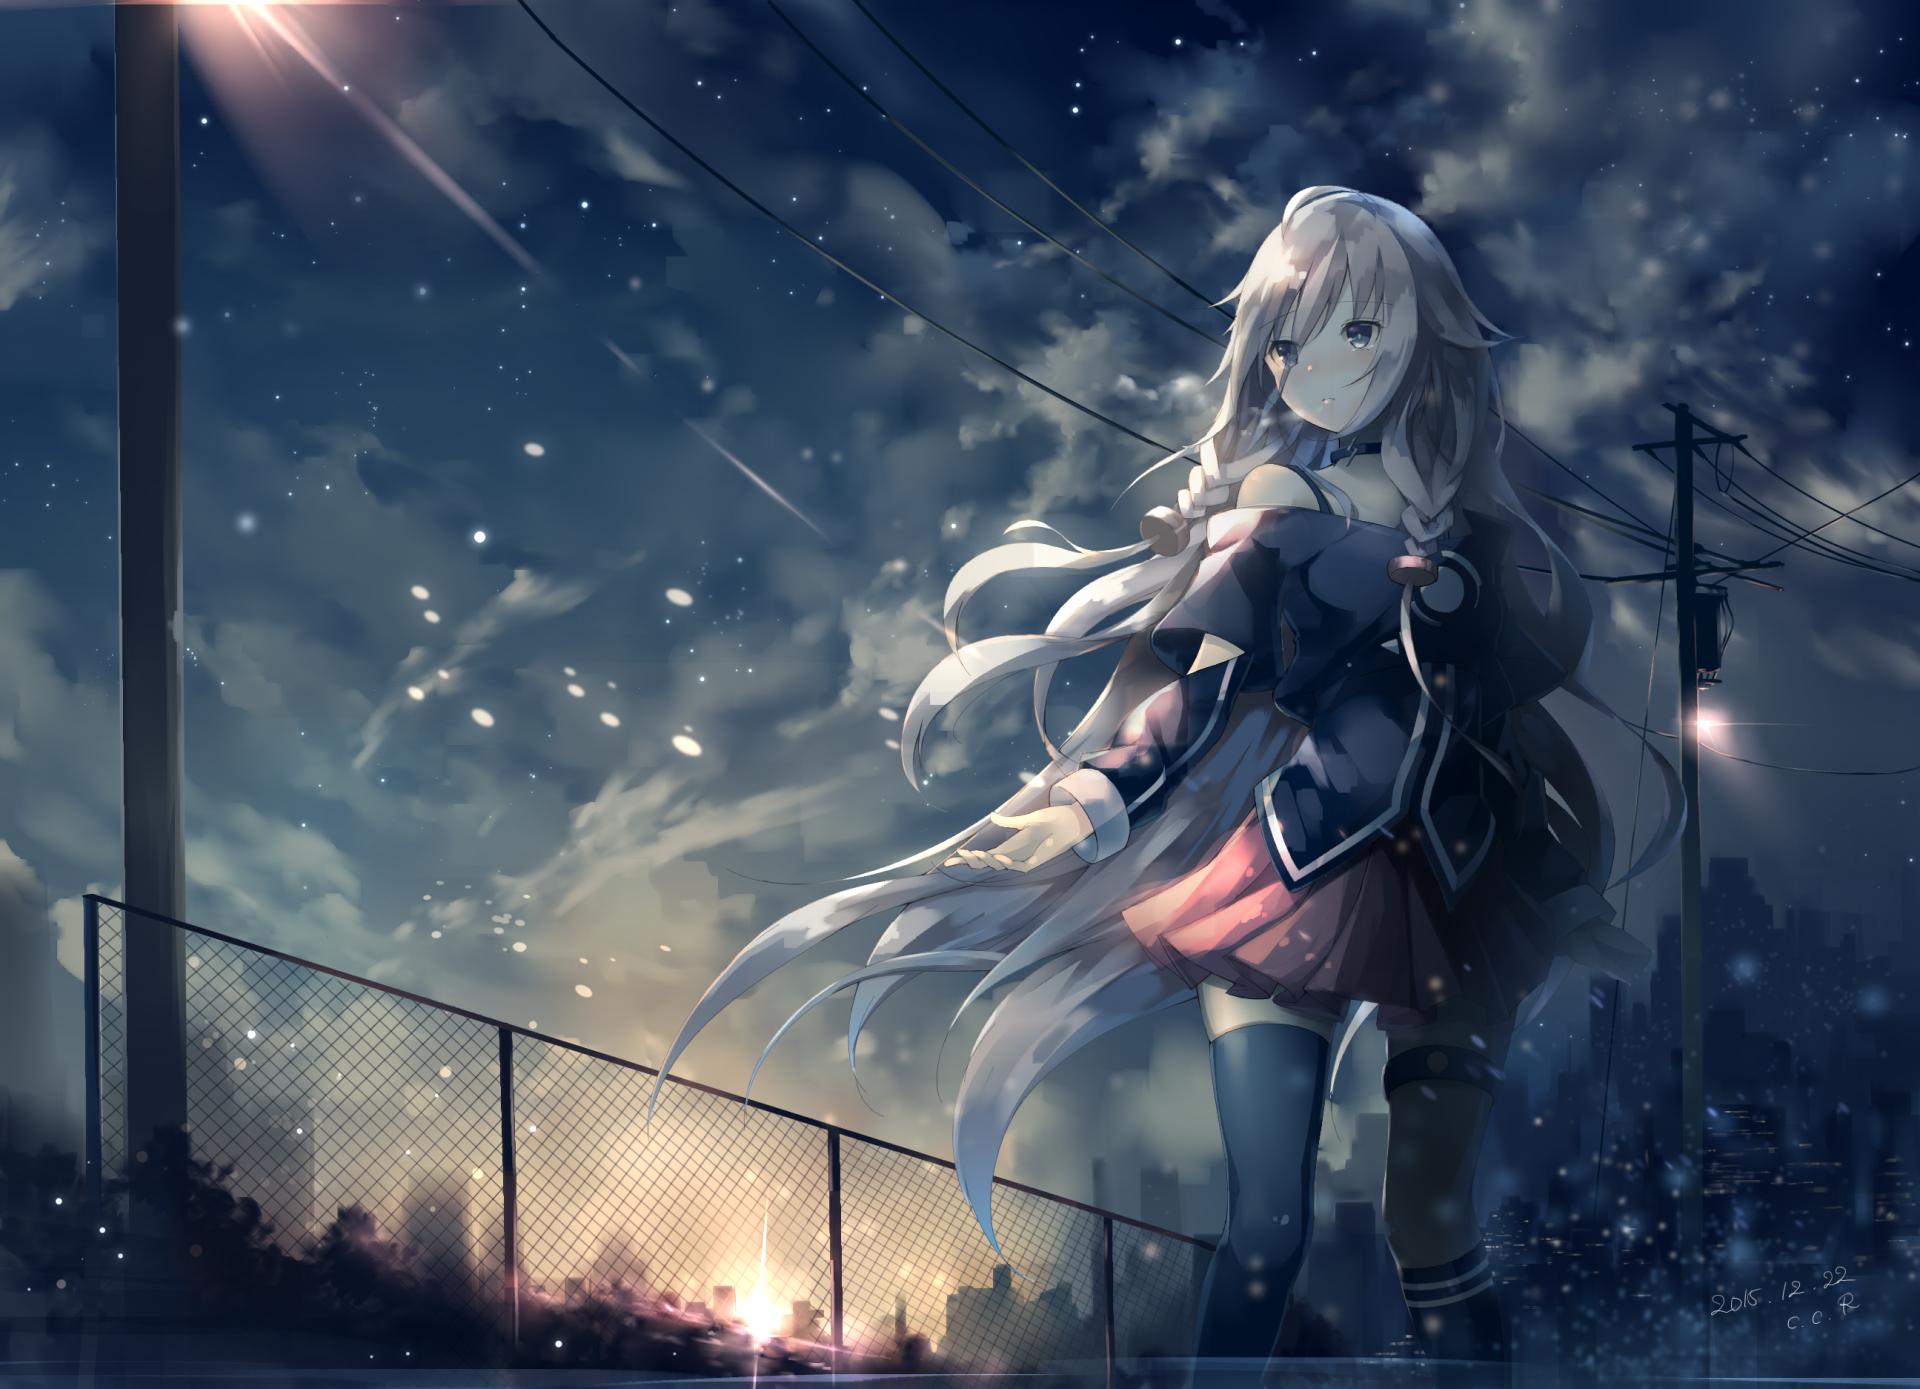 Anime - Vocaloid  IA (Vocaloid) Long Hair White Hair Braid Skirt Pantyhose Sunrise Original (Anime) Girl Light Cloud Sky Anime Wallpaper